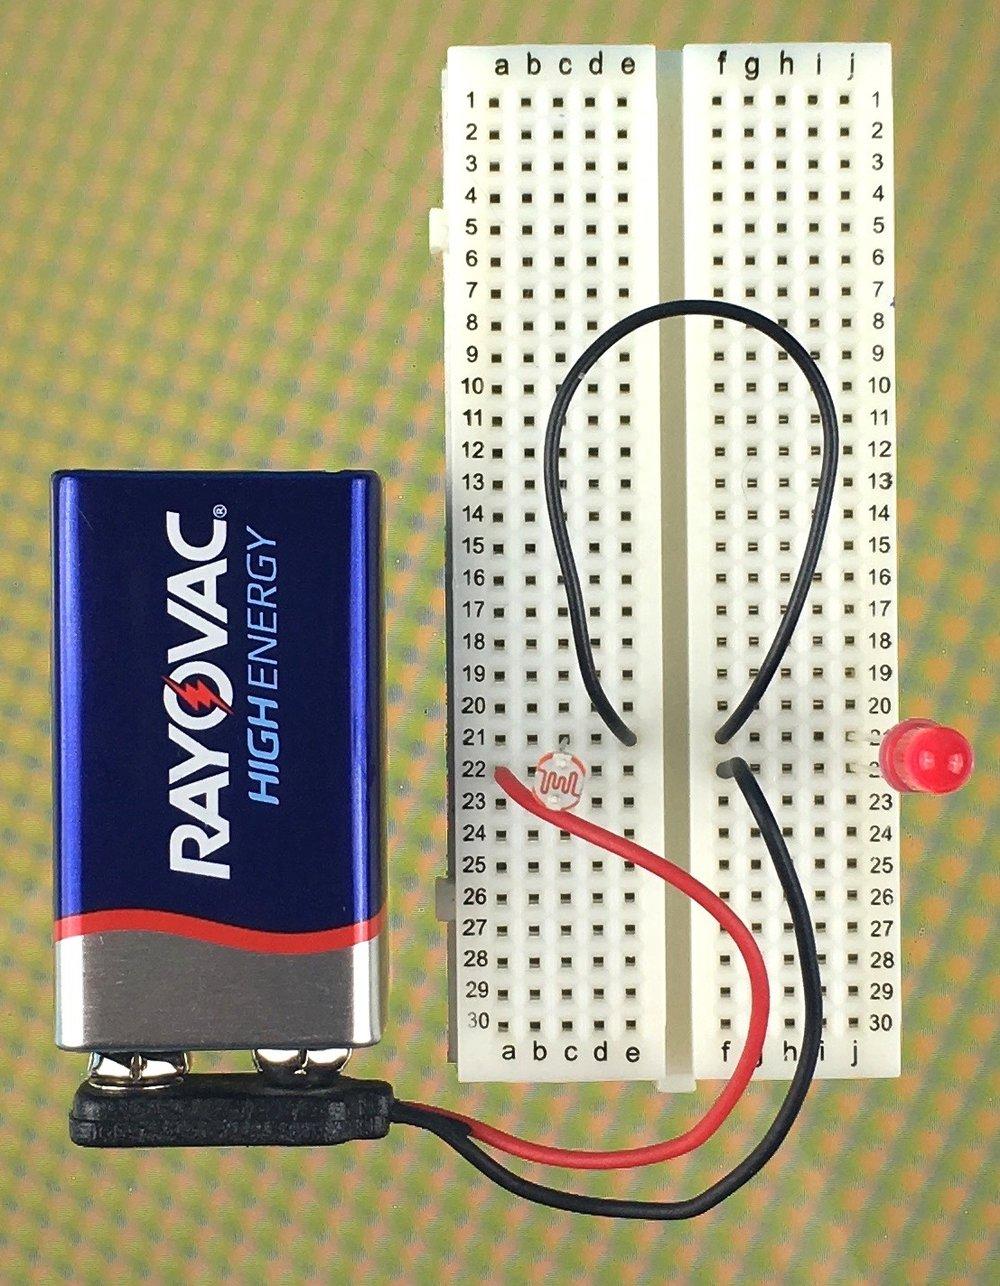 The Basics Lab 7 - intro to photocells